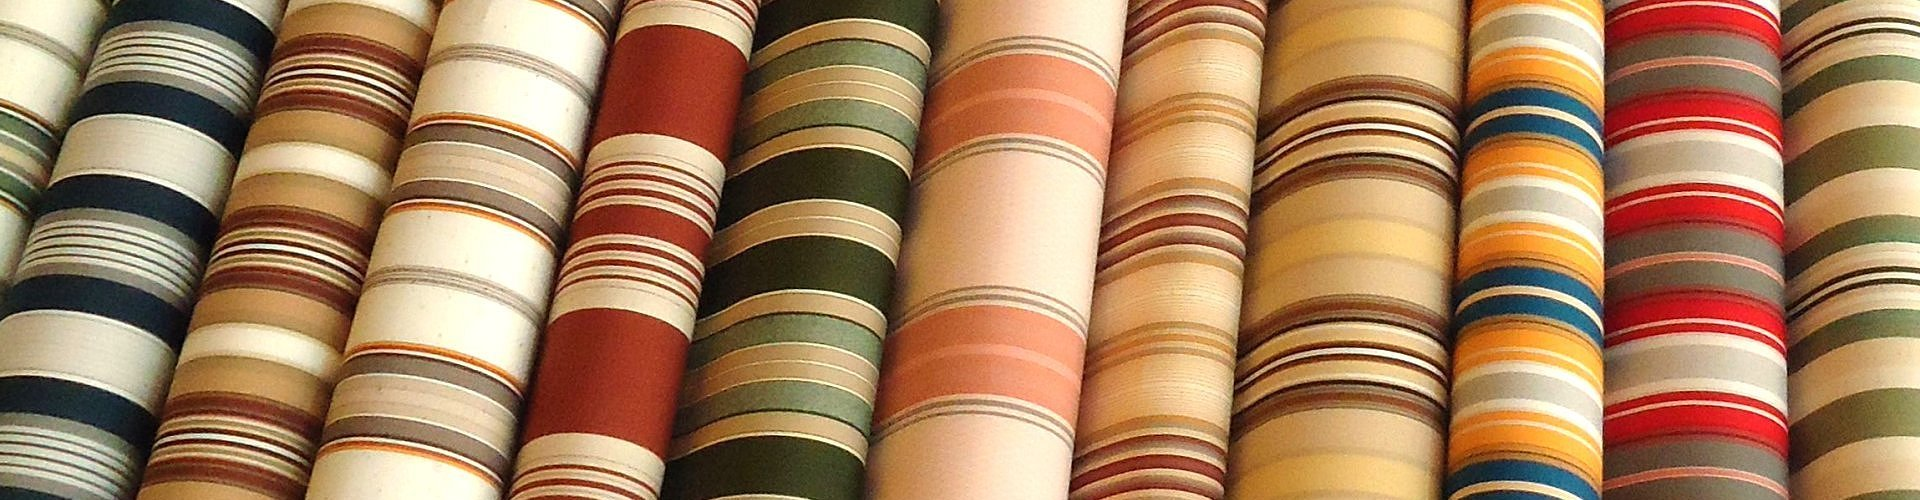 Awning Fabric - Retractable Awning Fabric SunSaverAwnings.com